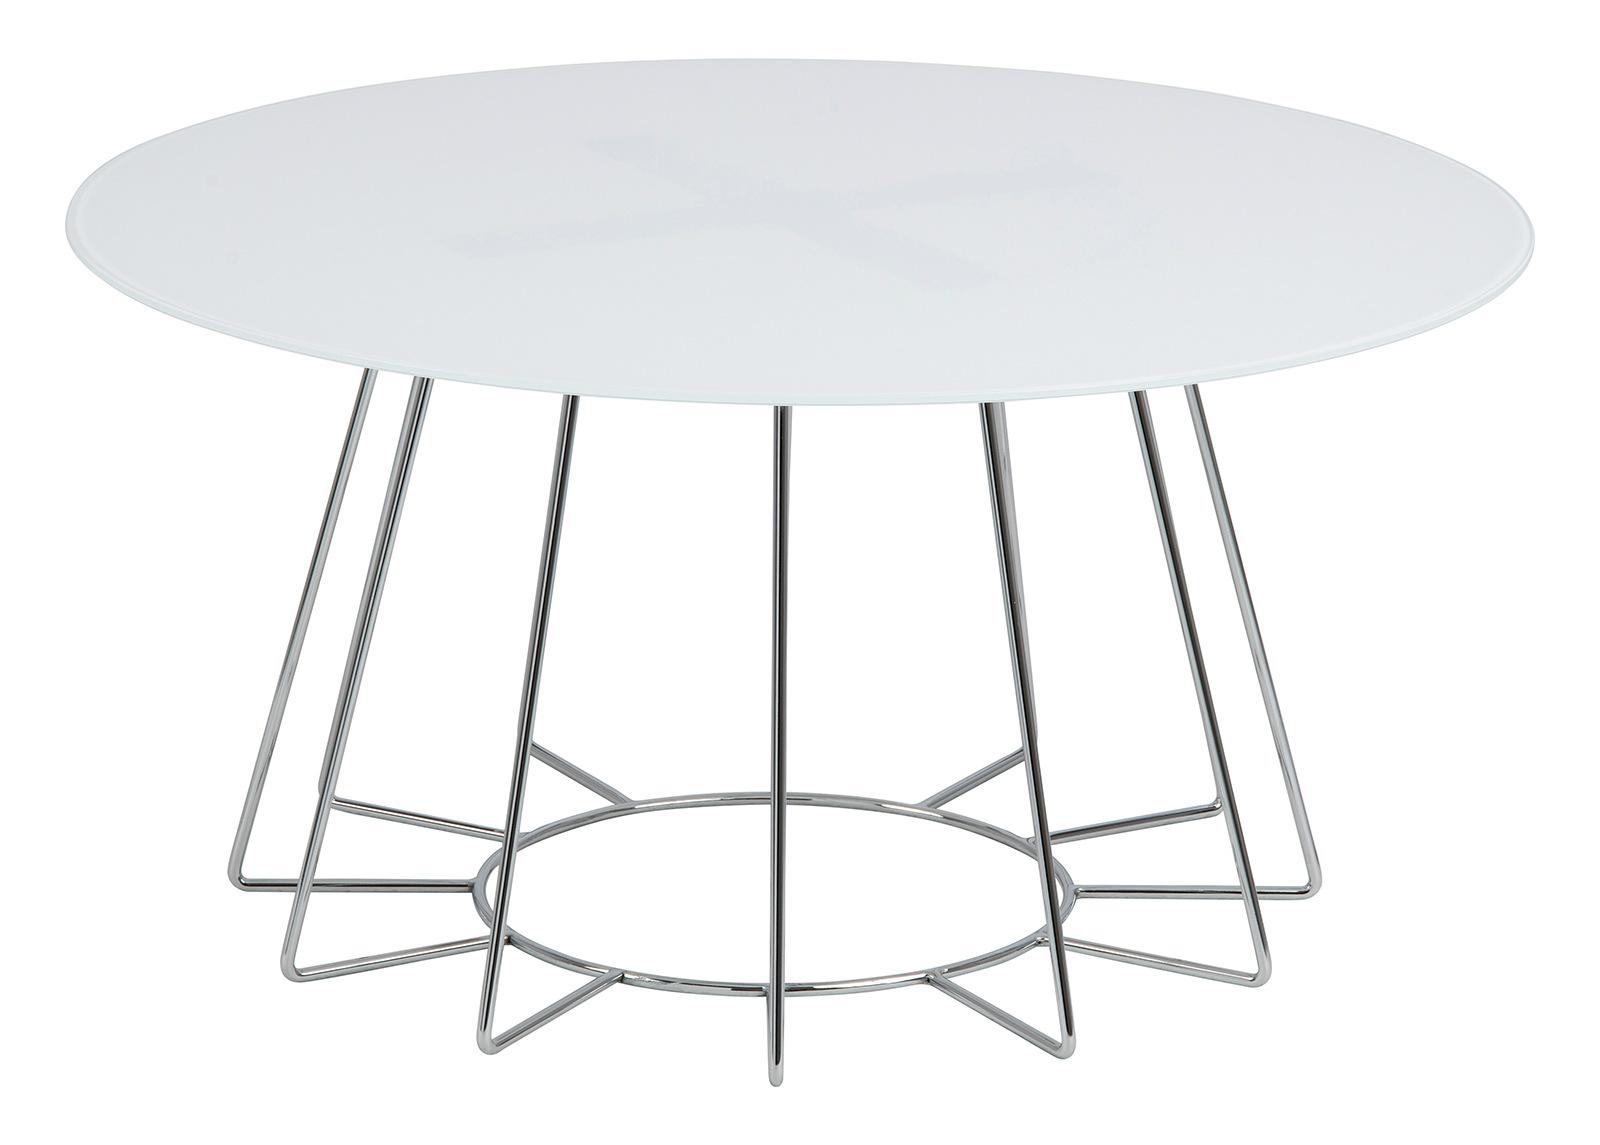 Sohvapöytä Casia Ø 80 cm